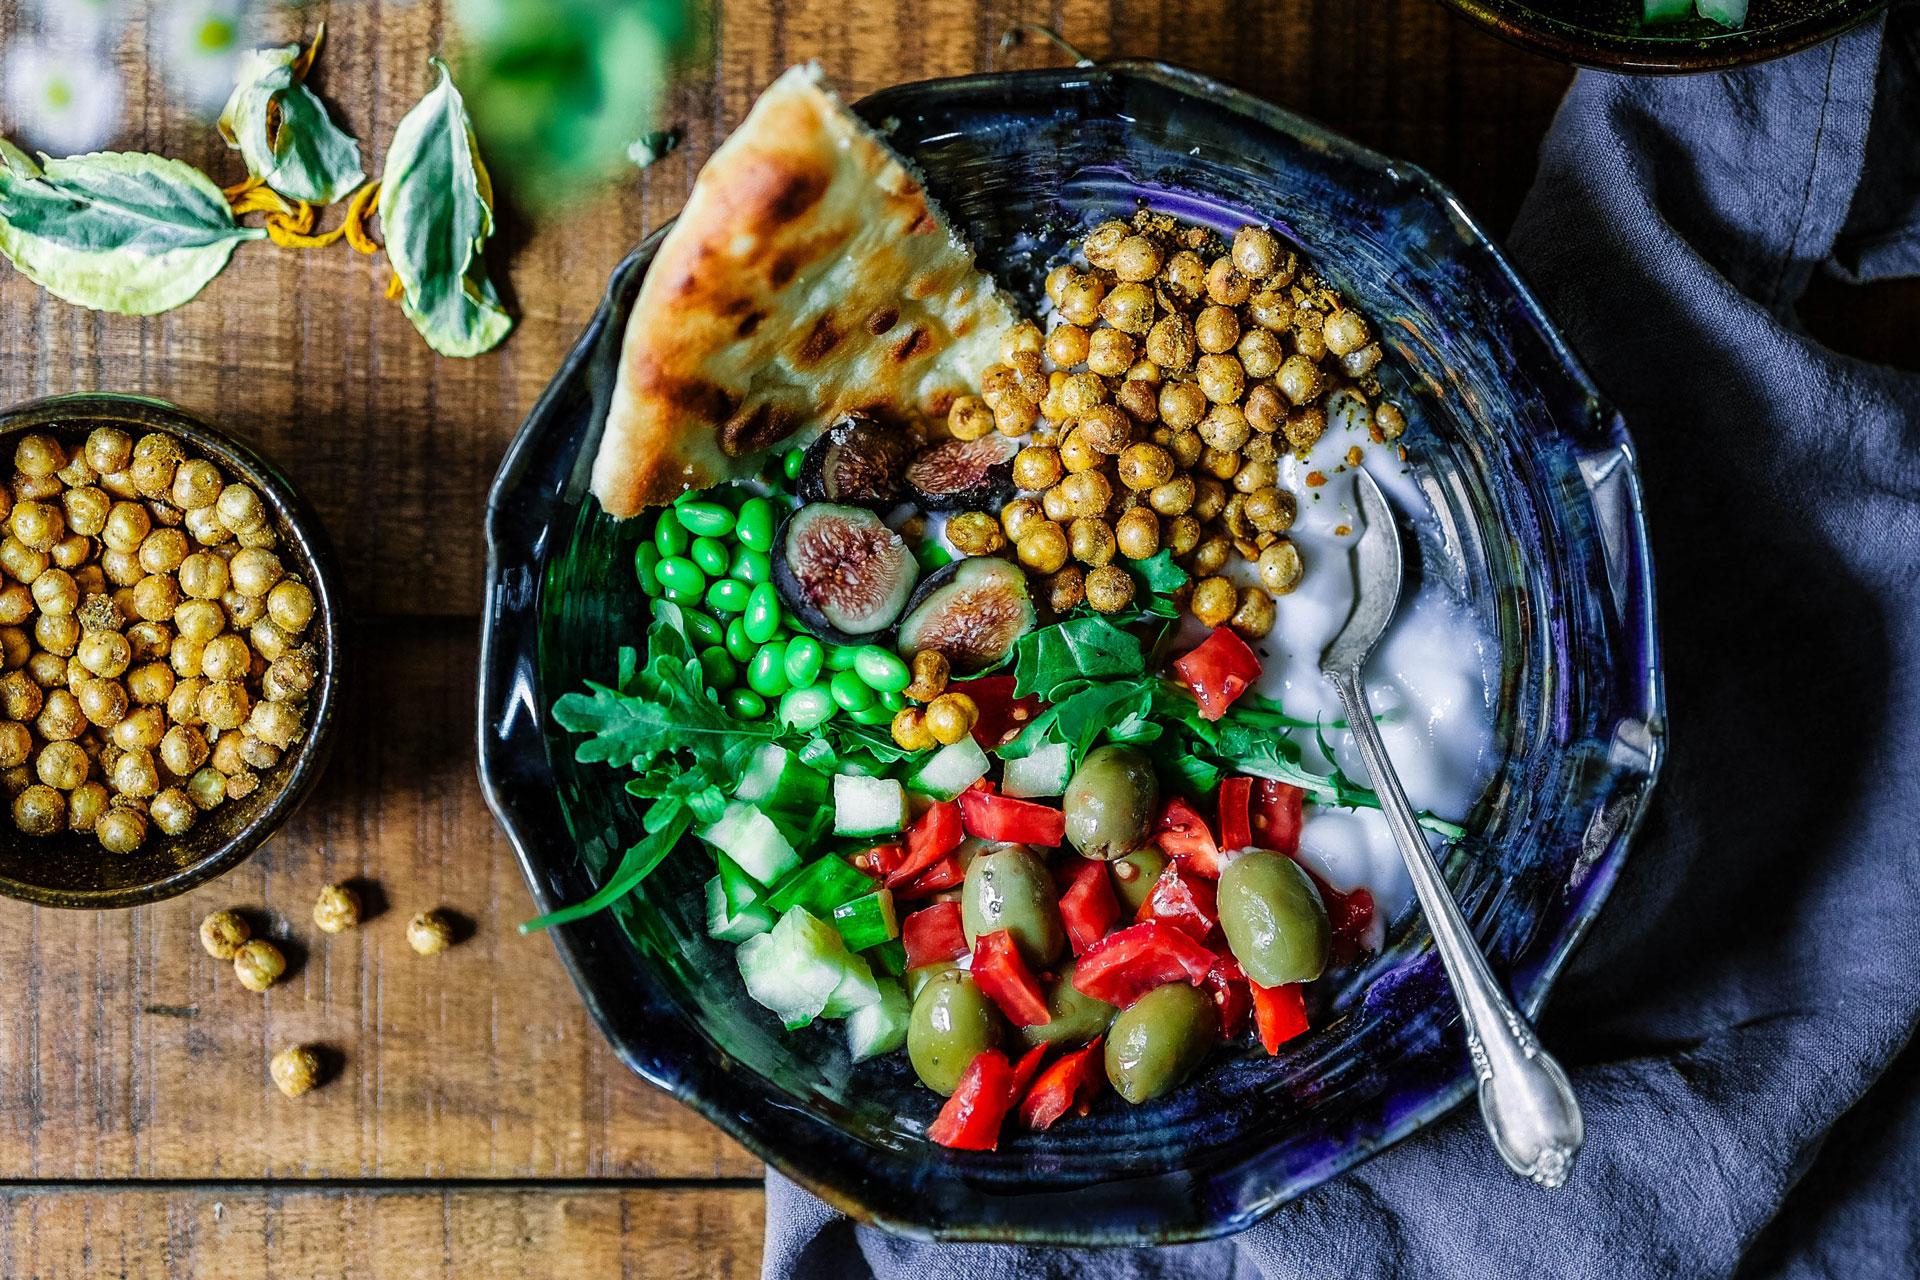 Beans, herbs, olives, yogurt in bowl